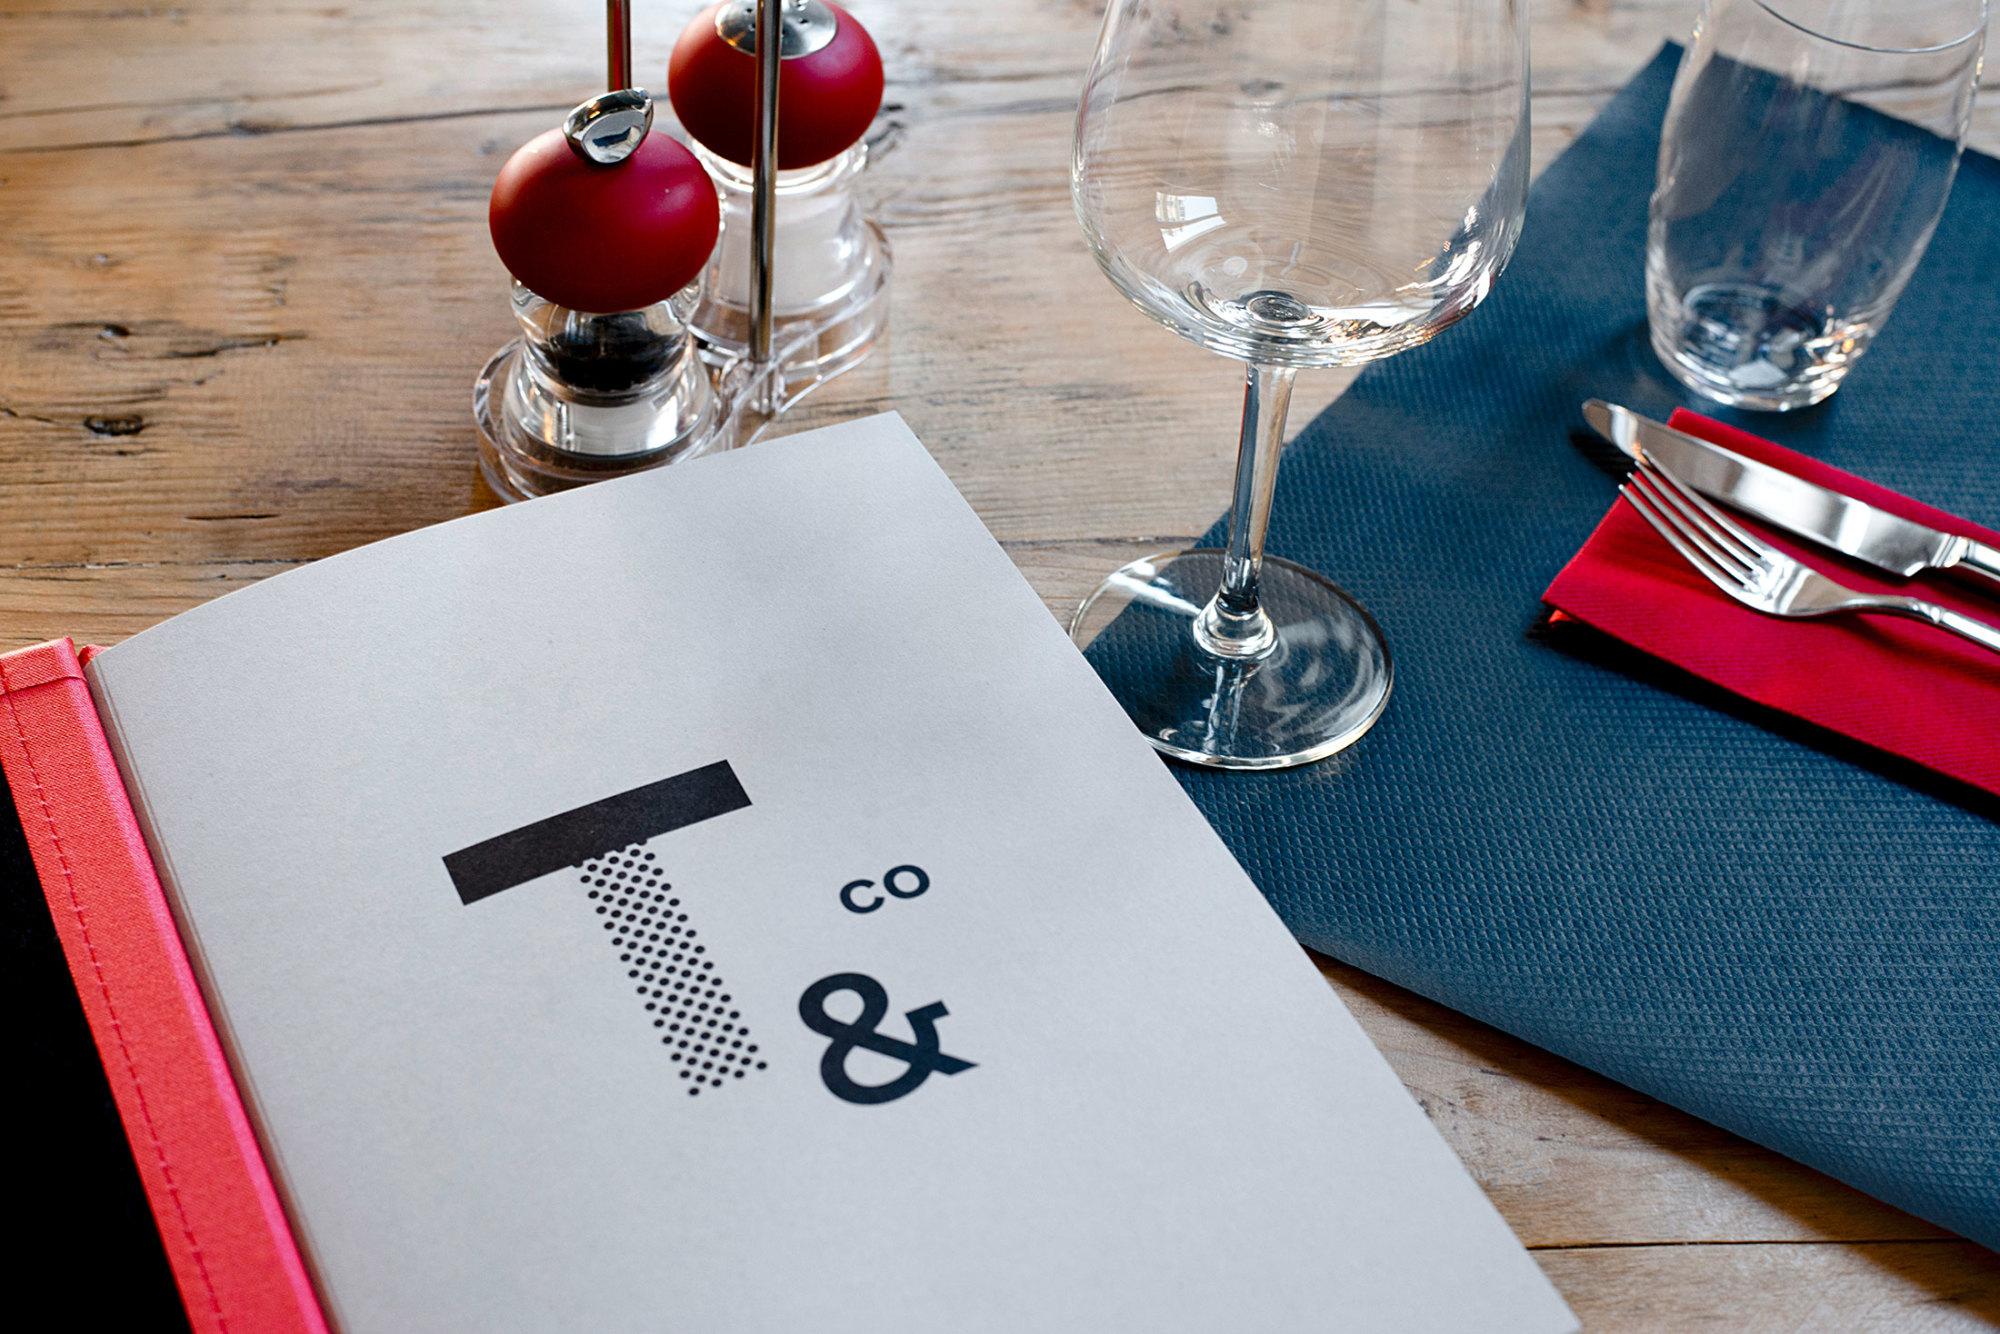 Graphisme Geneve graphic design graphique direction artistique logo identité visuelle identity branding brand  tartares & co bar restaurant grand prix 2015  menu